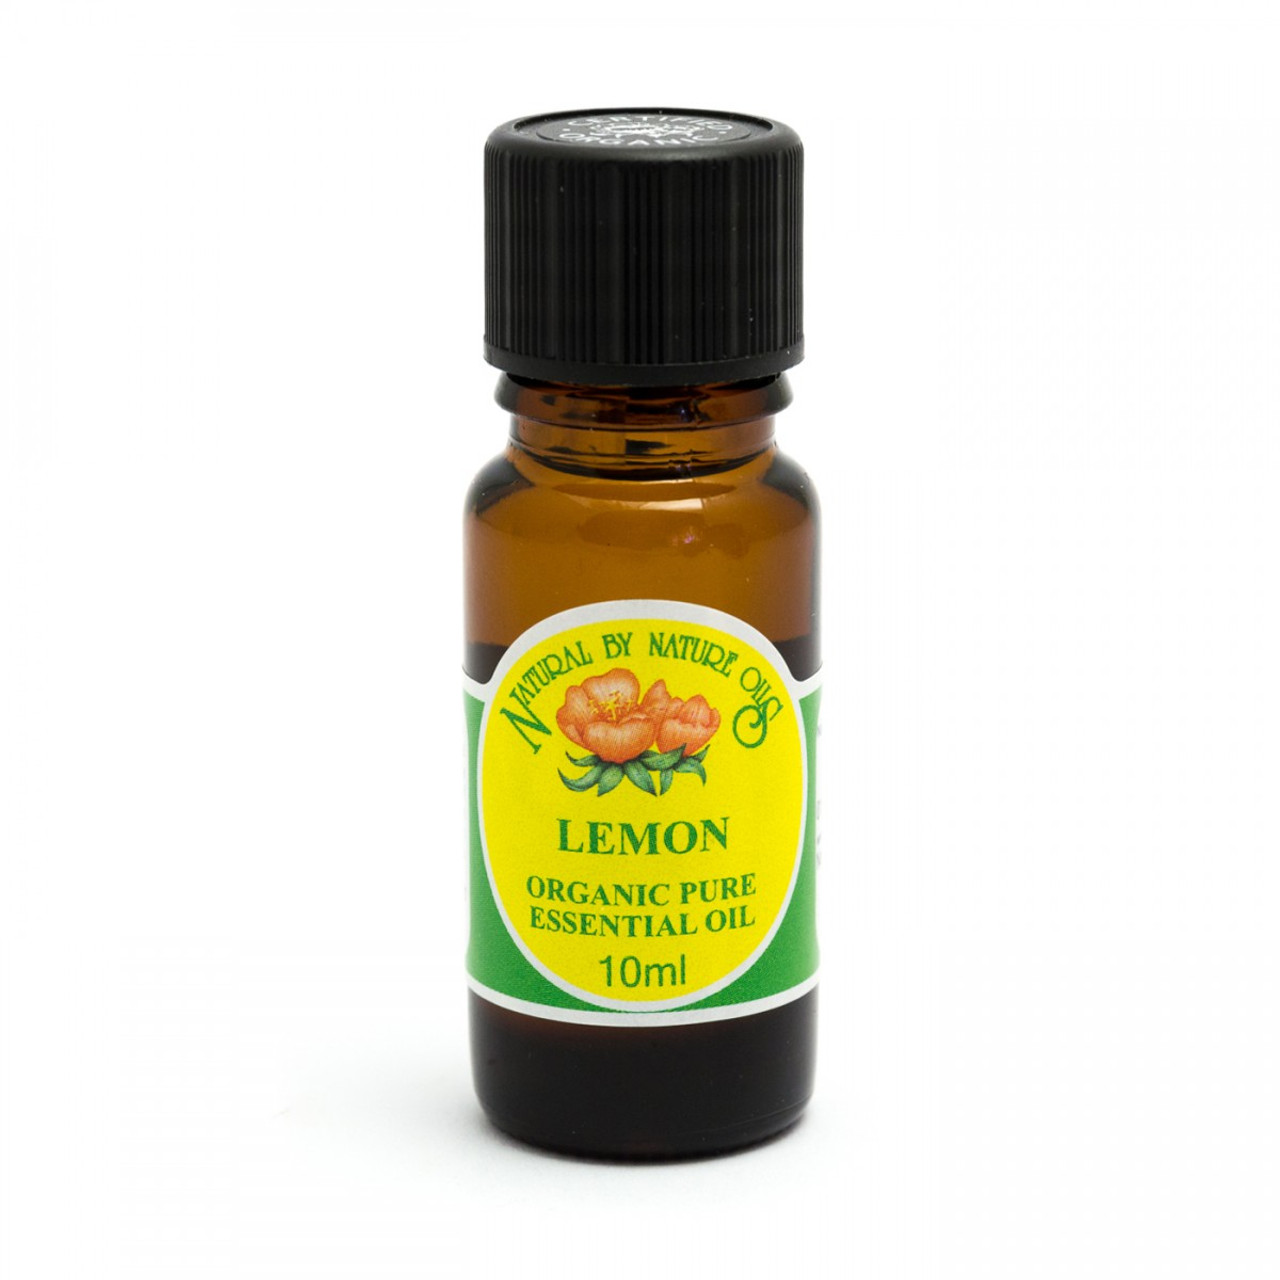 Lemon Organic Pure Essential Oil (France) 10ml